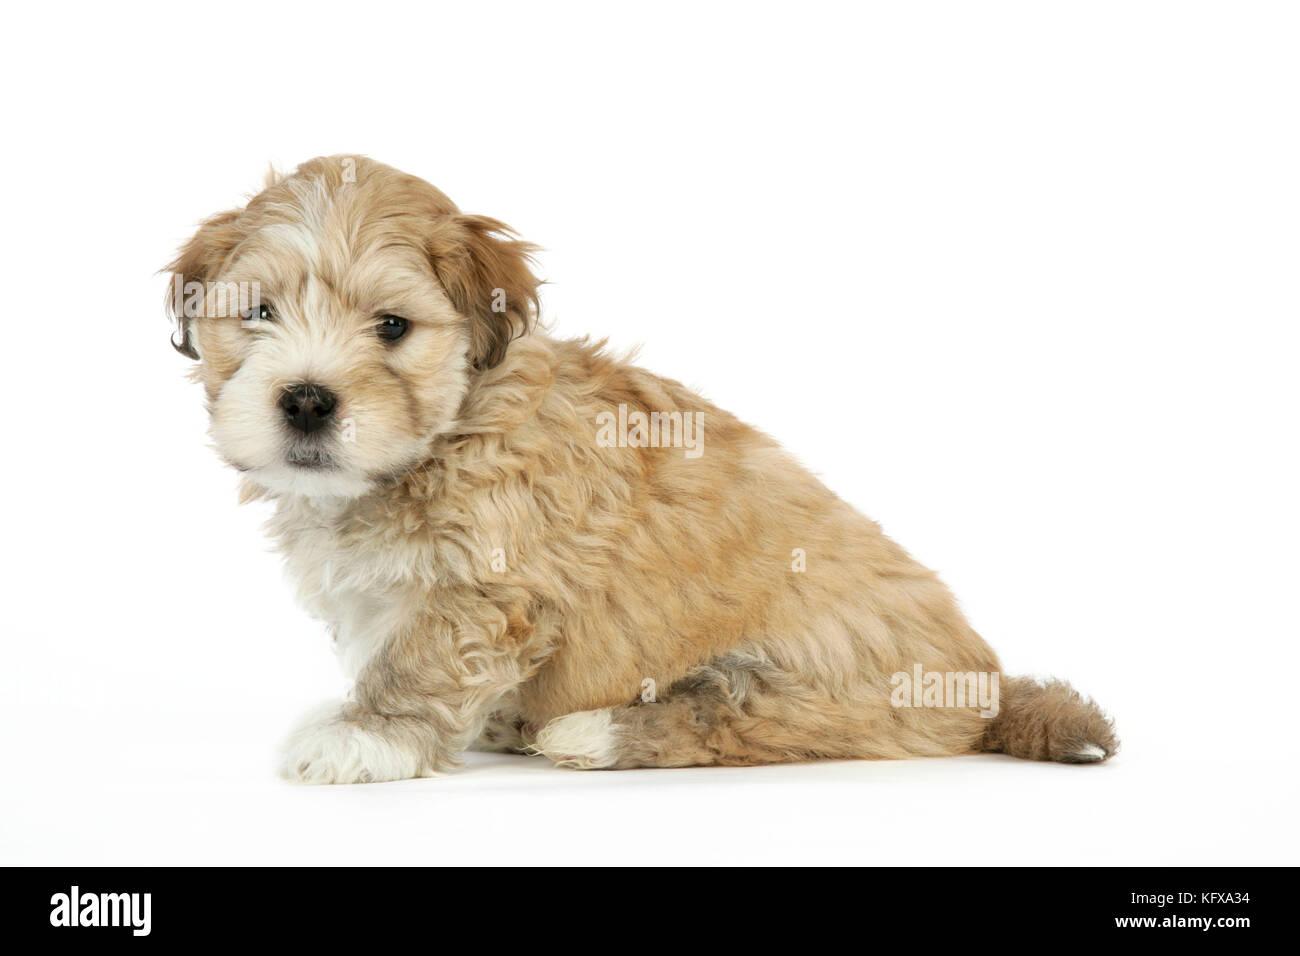 Dog 7 Weeks Old Lhasa Apso Cross Shih Tzu Puppy Stock Photo